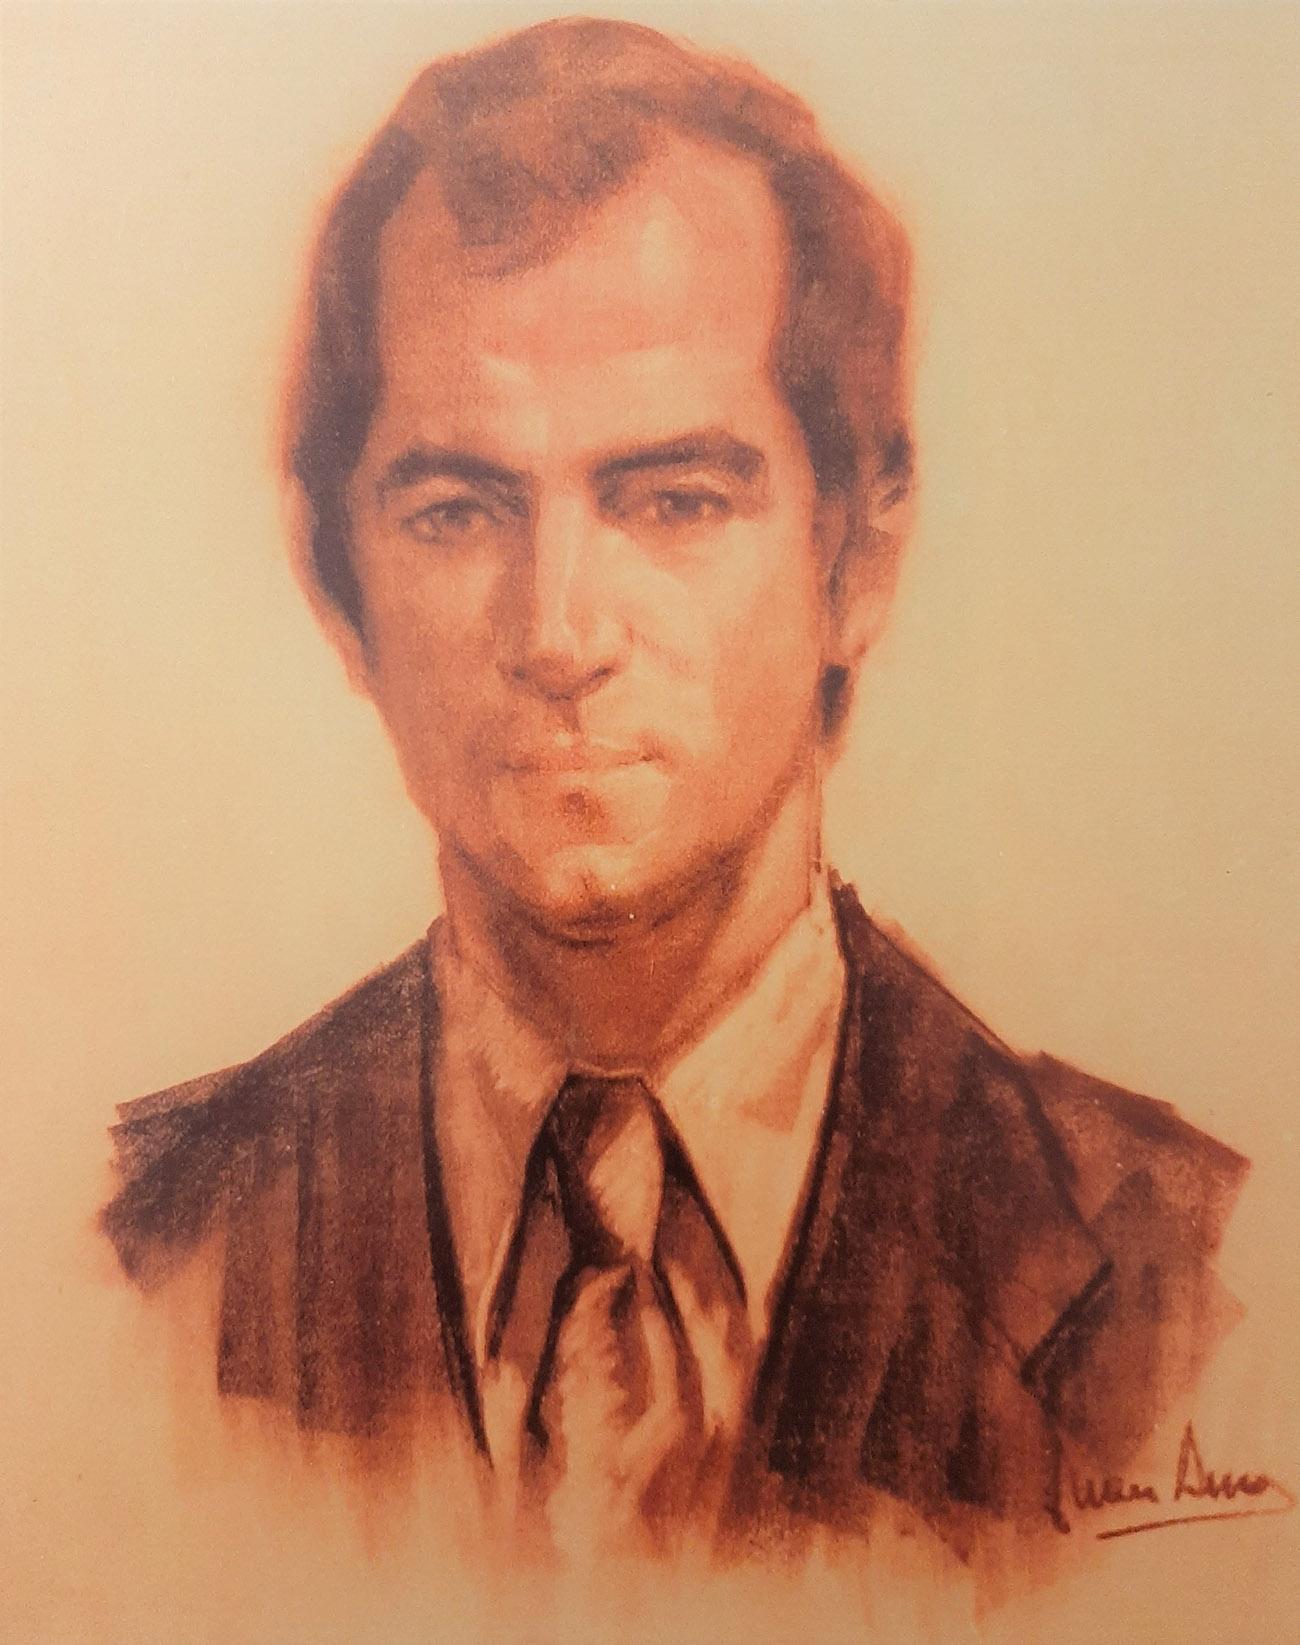 ÁNGEL CUENCA. Retrato Dibujo de Juan Amo.